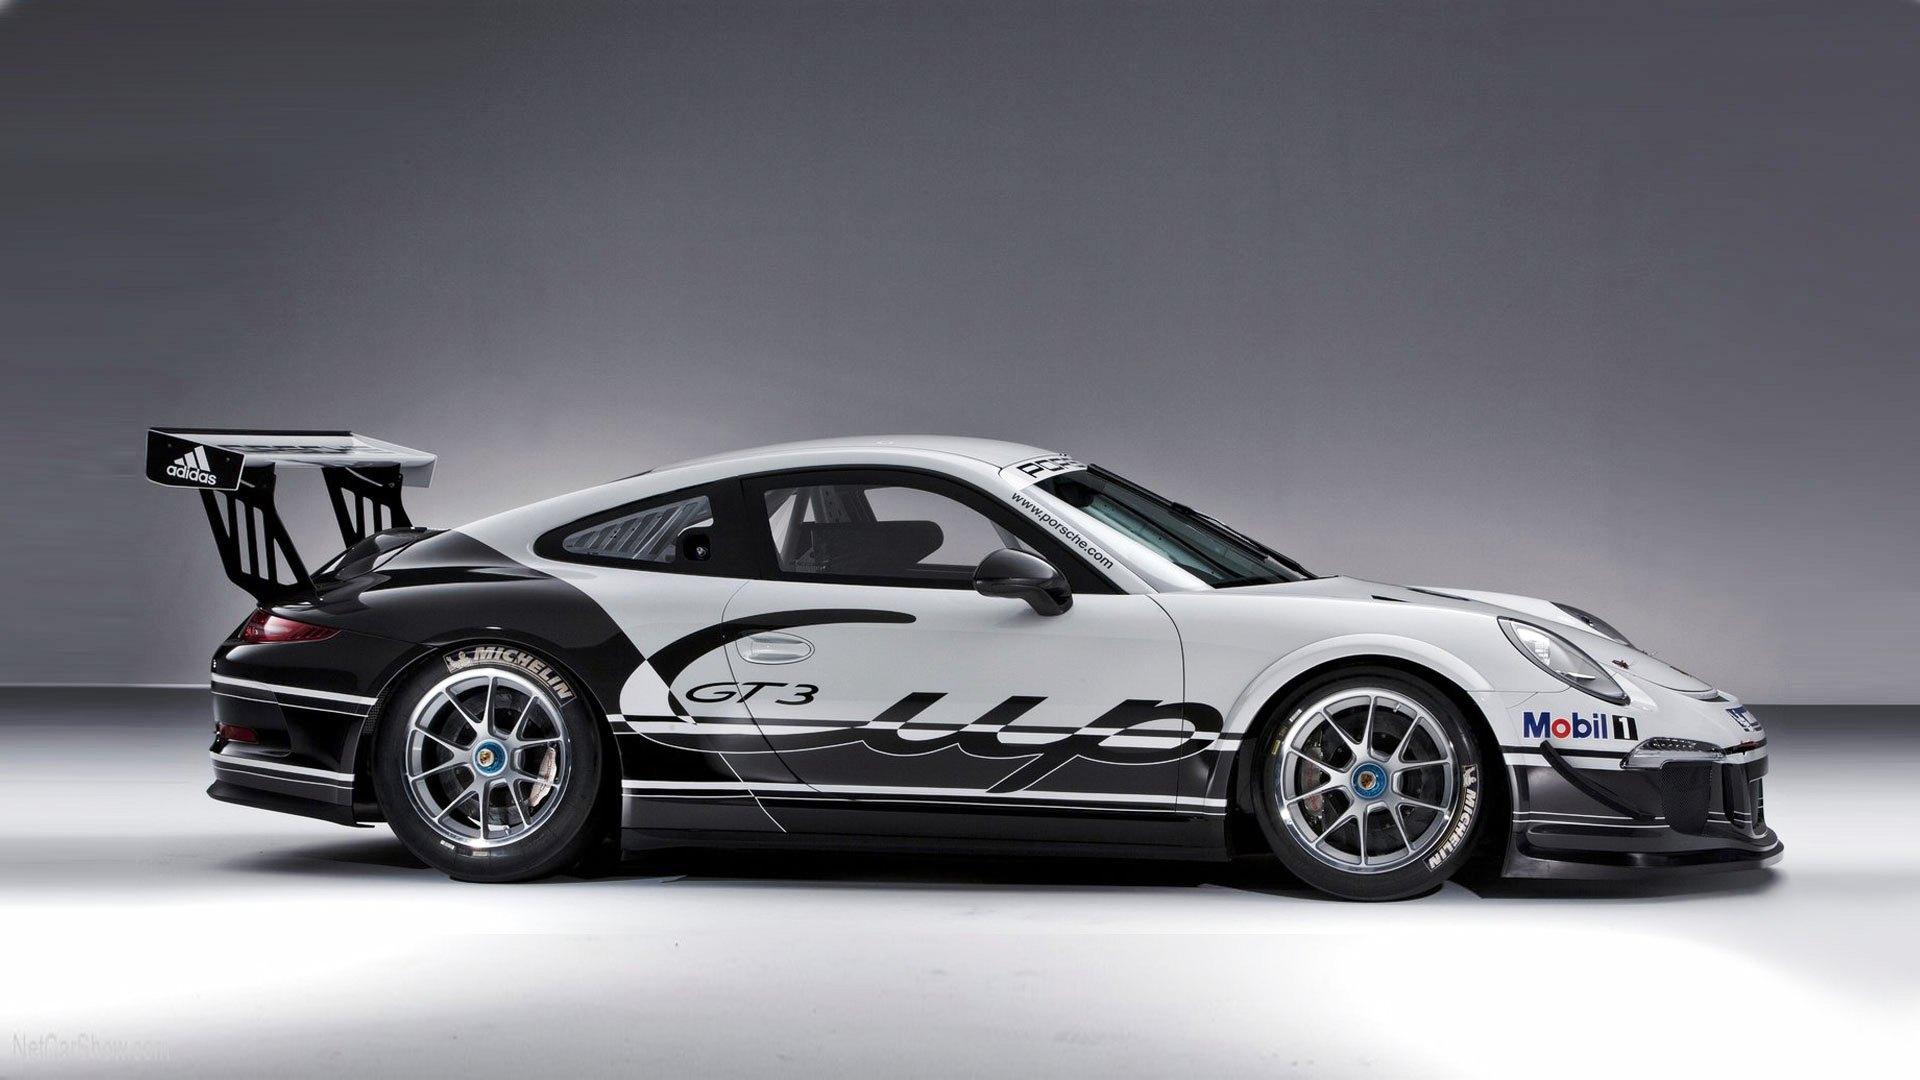 Porsche 911 Car HD 1920x1080